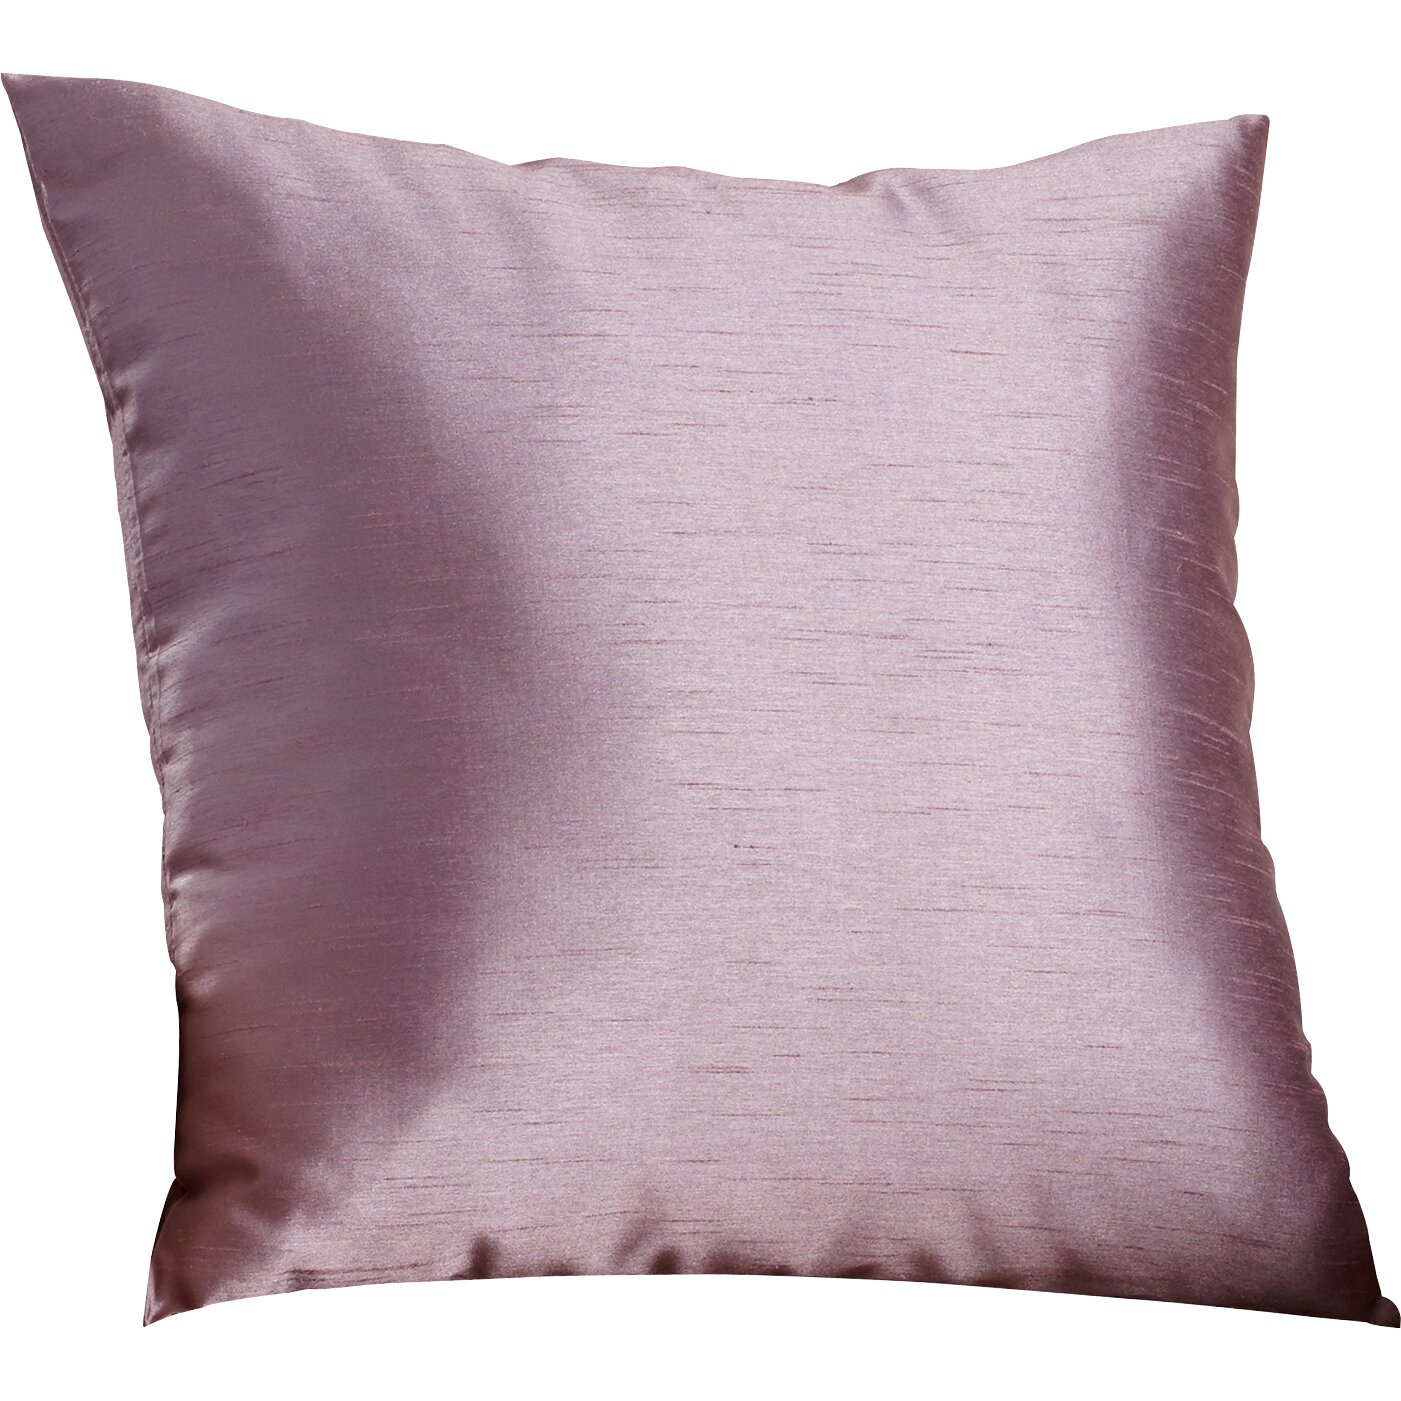 Astoria Grand Appley Solid Luxe Synthetic Throw Pillow & Reviews Wayfair.ca